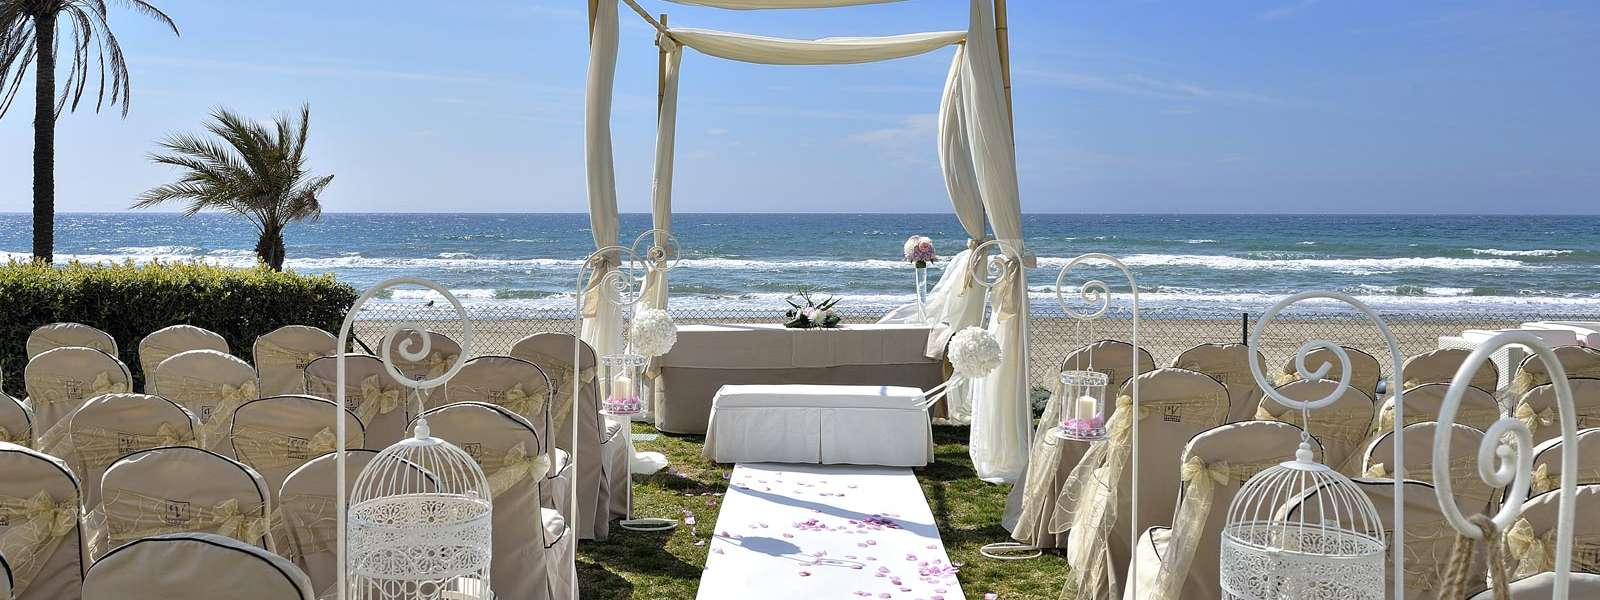 Bodas | Beach Club Estrella del Mar